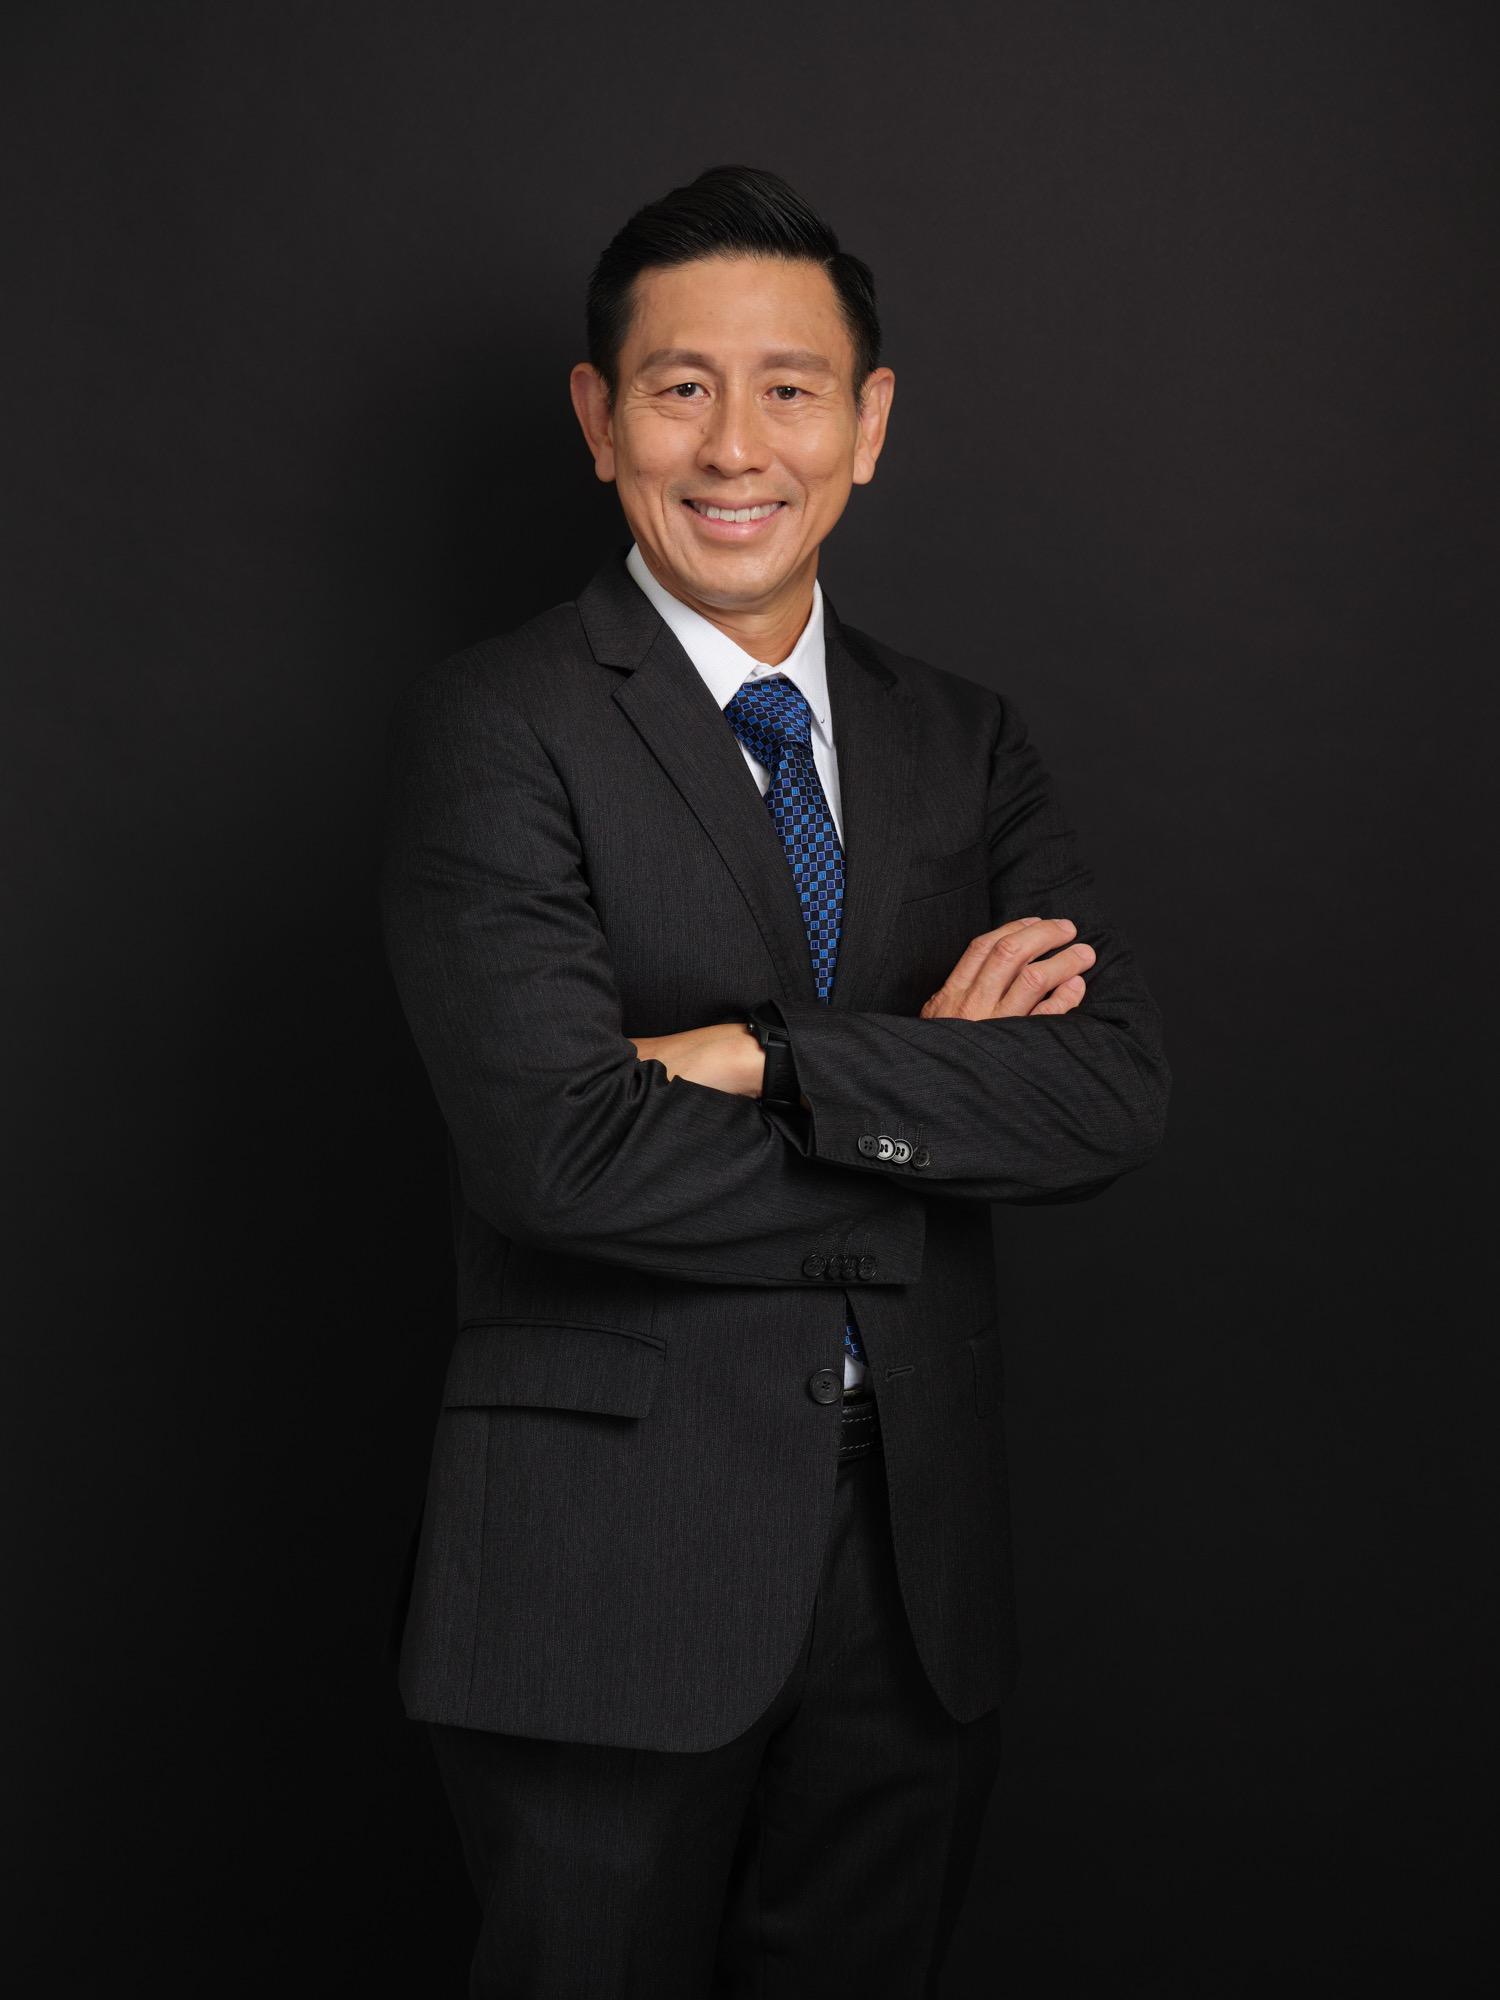 Headshot Photography Portrait Photographer Singapore Coco Creative Studio 5-4